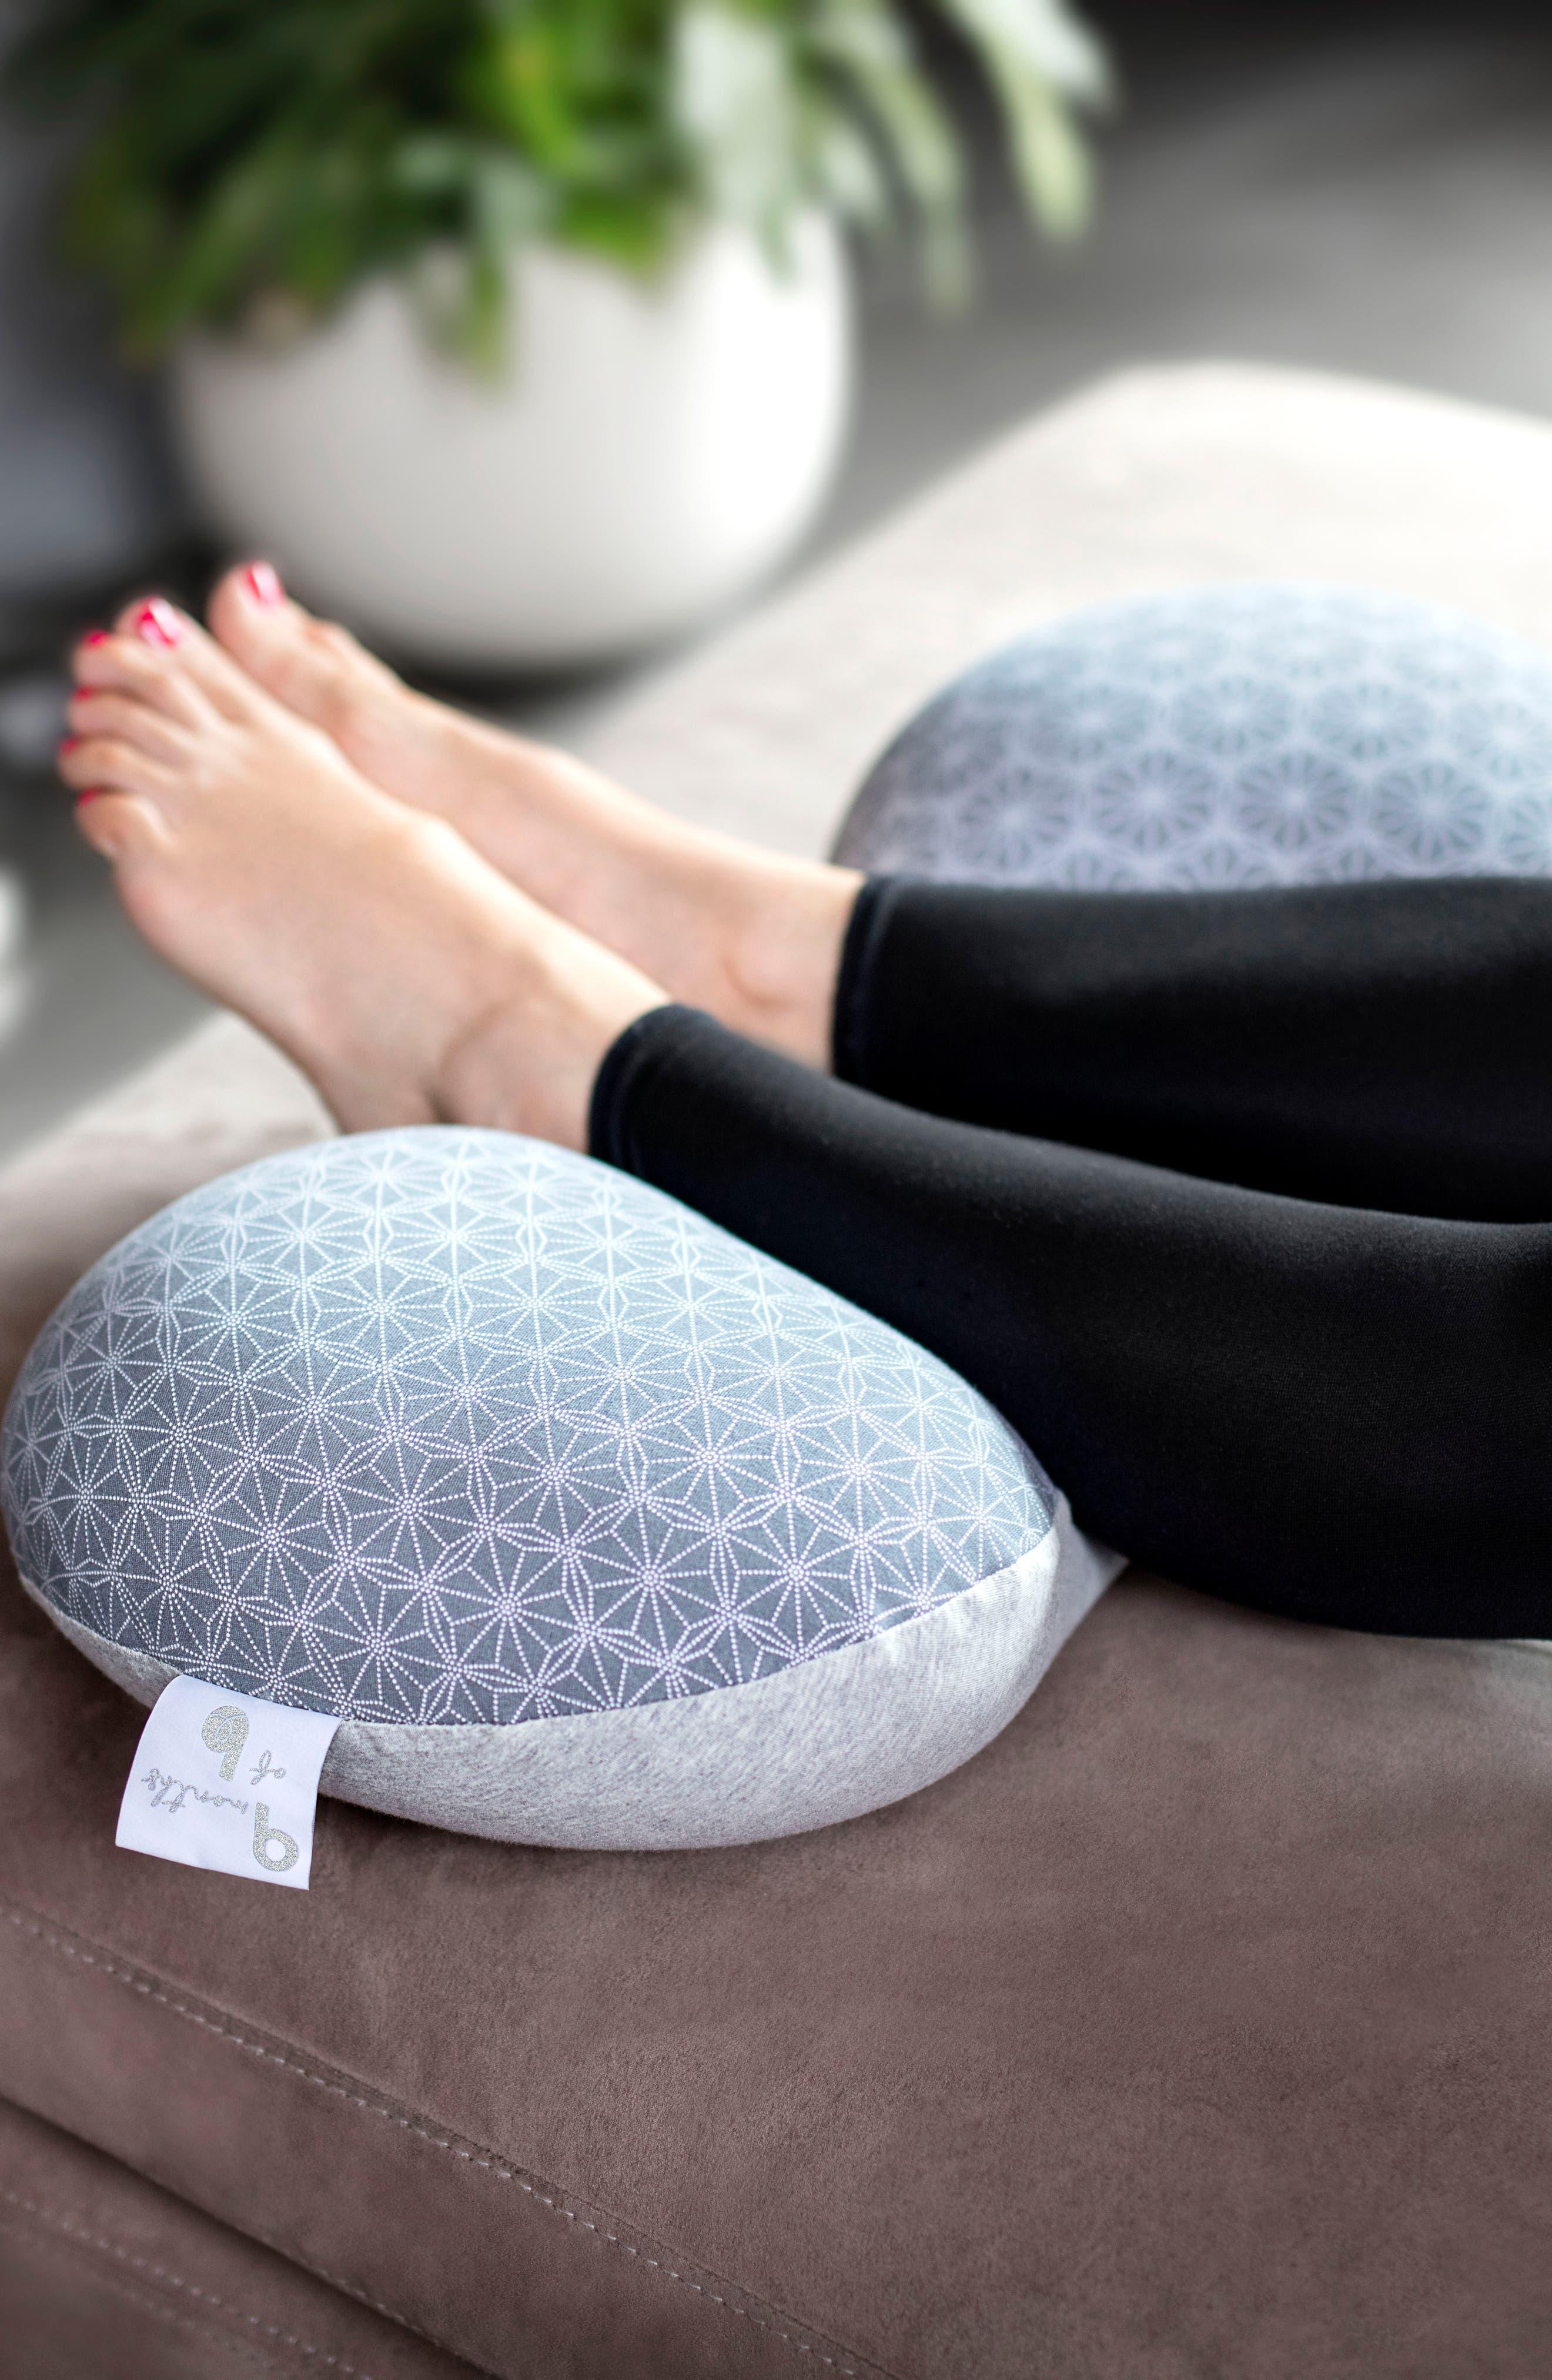 Multiuse Ergonomic Maternity Pillow,                             Alternate thumbnail 8, color,                             Dotwork